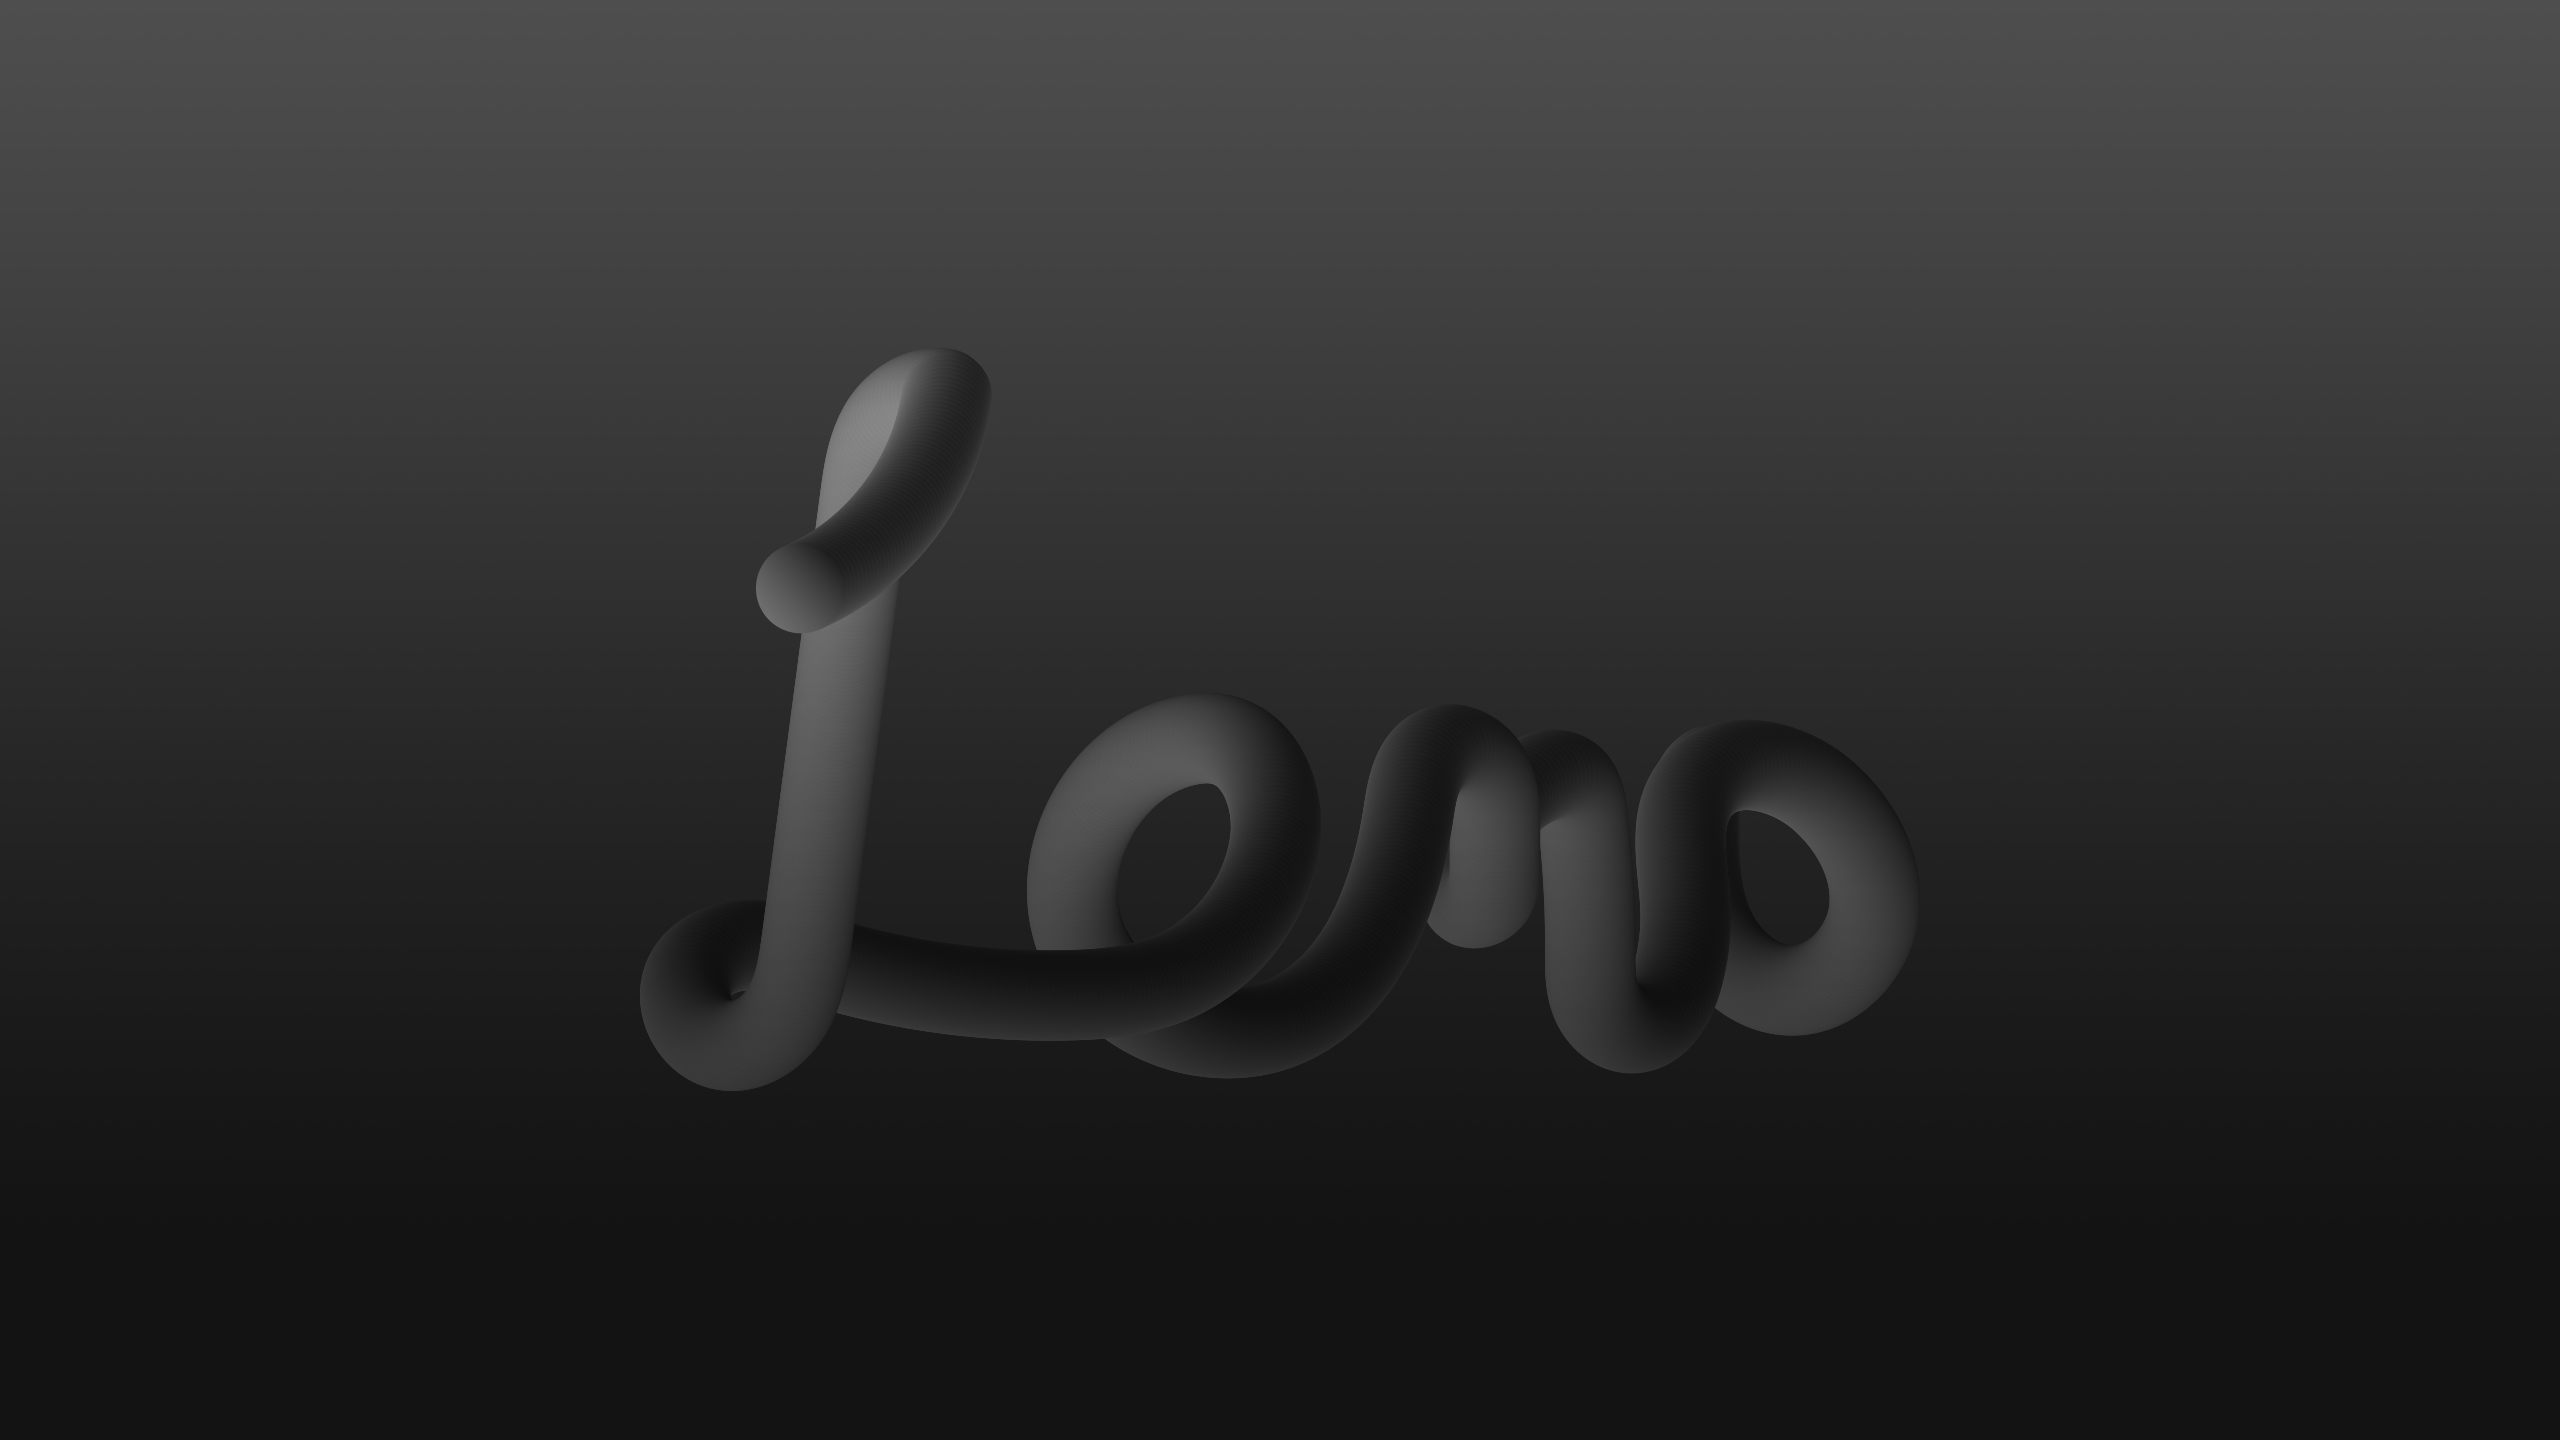 lemo-web_homepage_slider_01.2